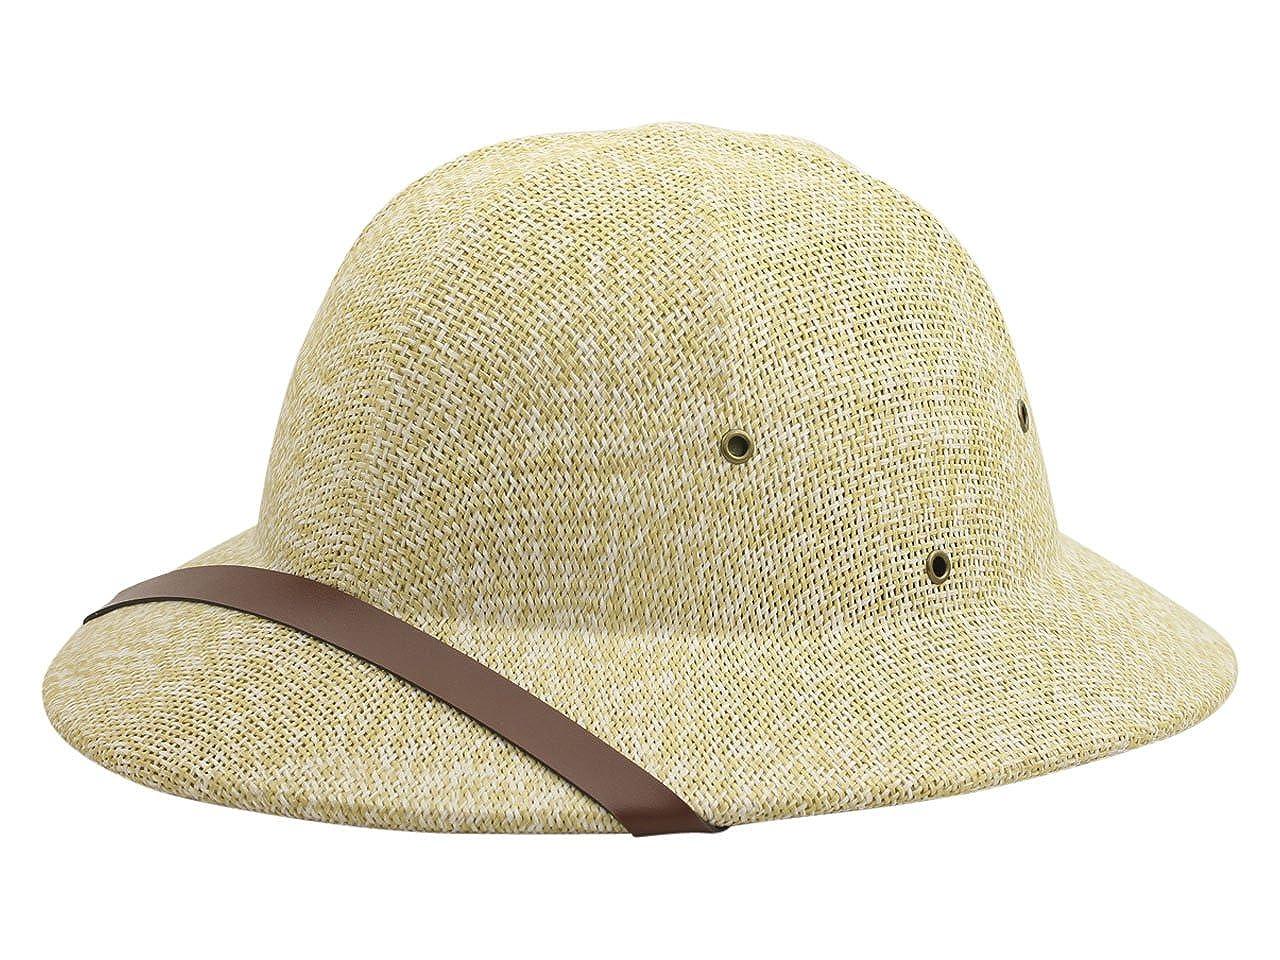 DPC Global Trends Men's Fine Twisted Toyo Pith Helmet